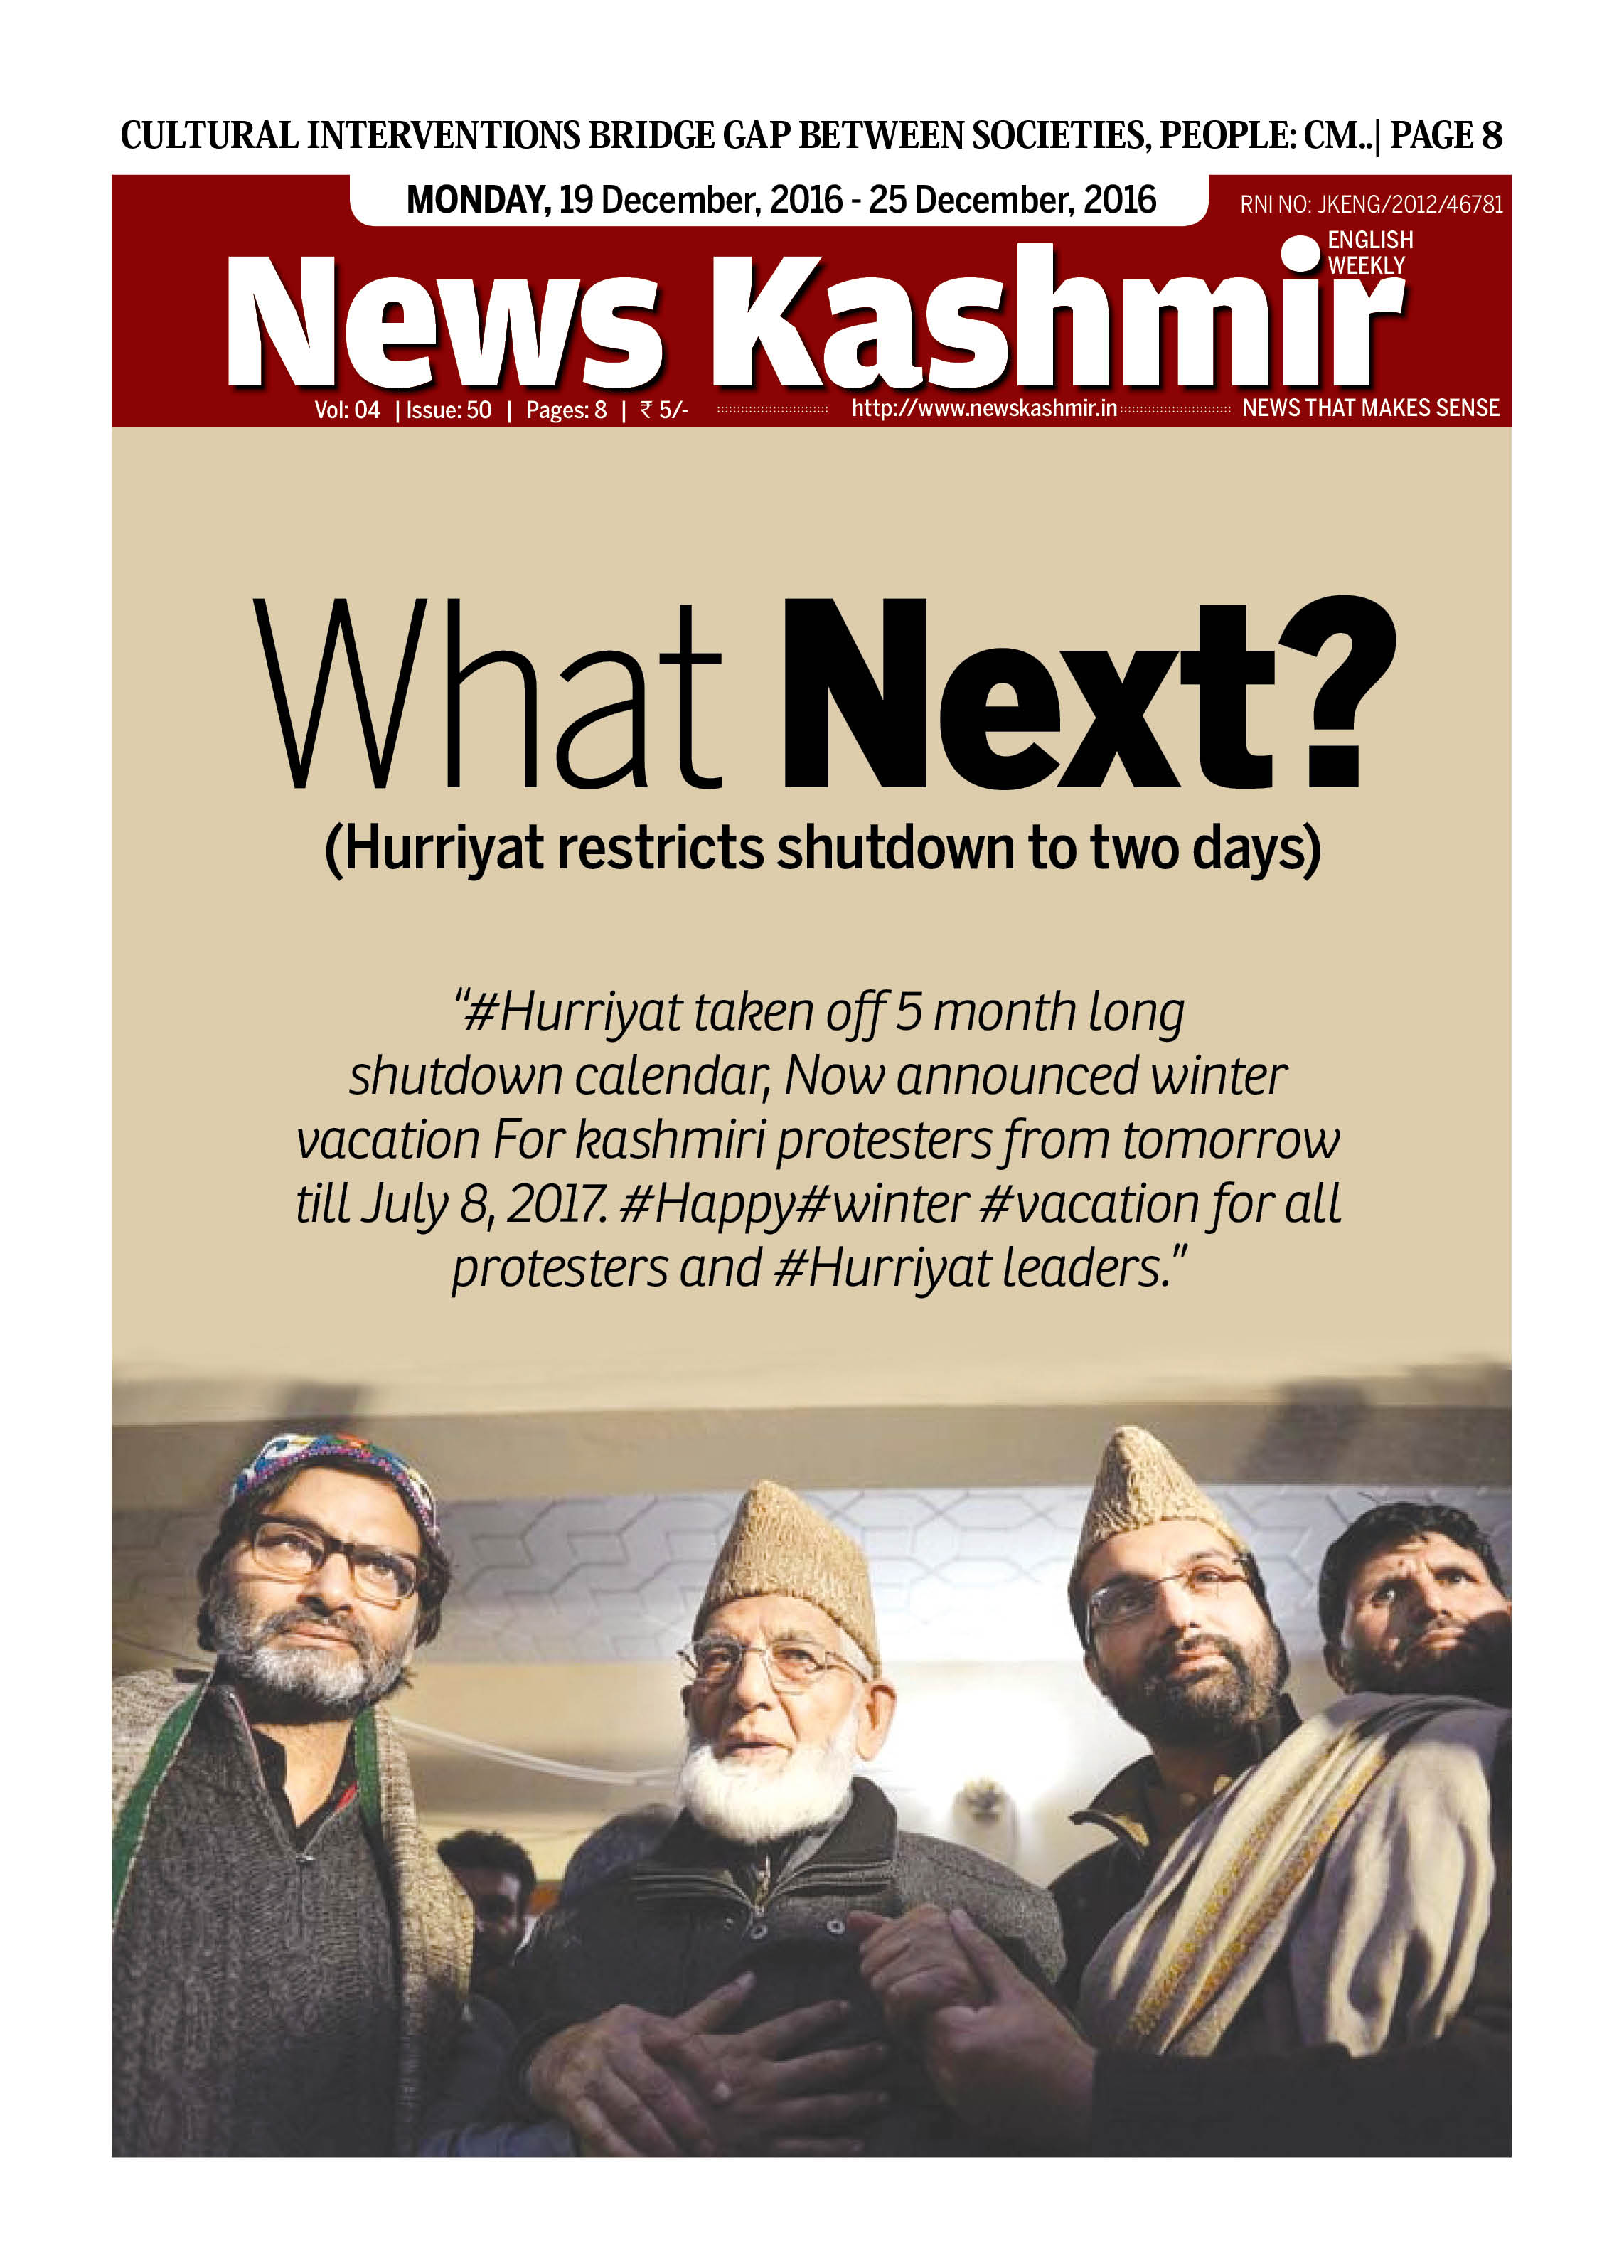 What Next? (Hurriyat restricts shutdown to two days)